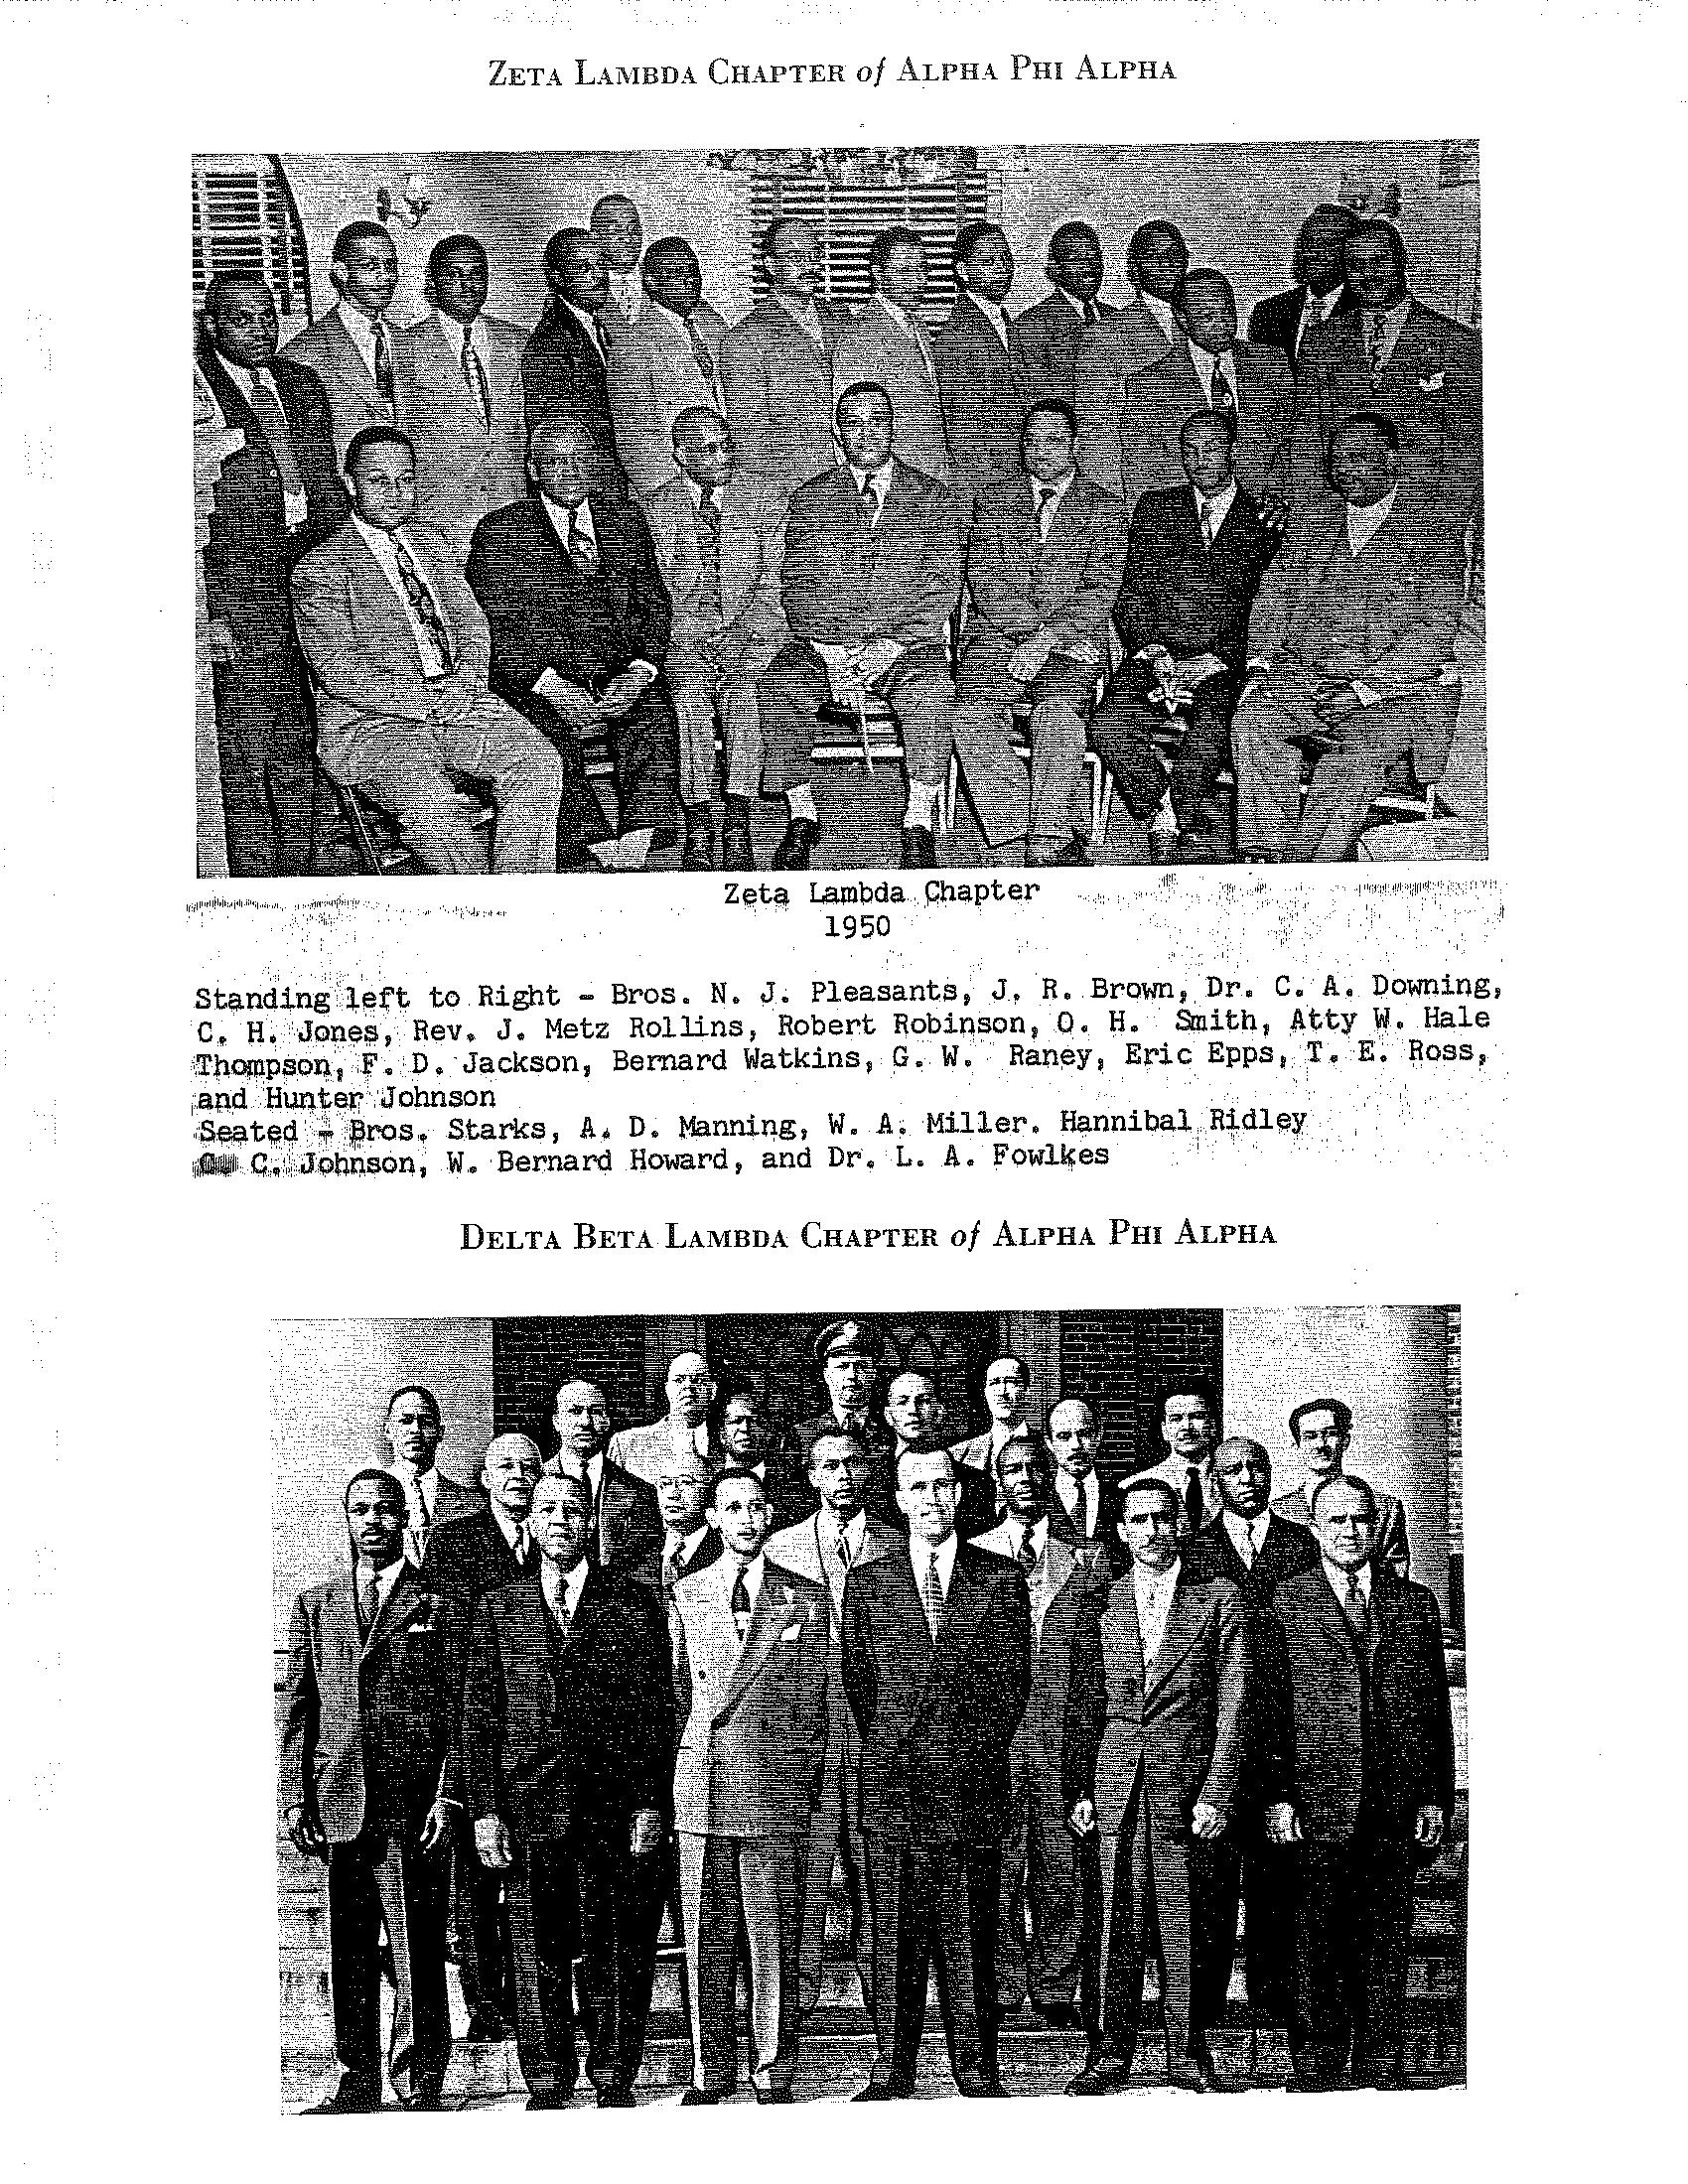 Zeta Lambda 1950.png